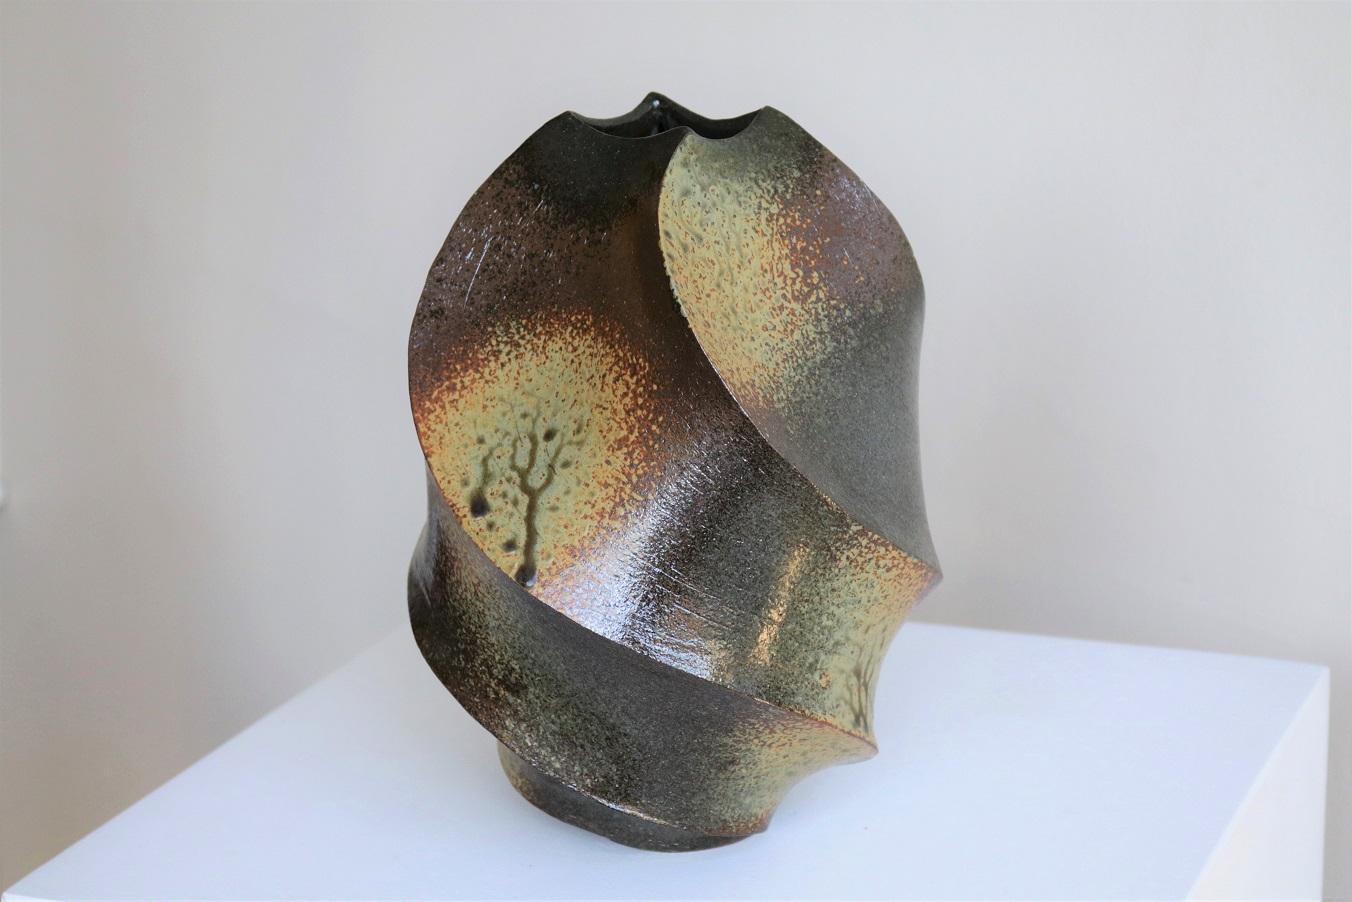 Terunobu Hirata, Up-Spiral,  stoneware, ash glaze, H26cm, 2018 SOLD